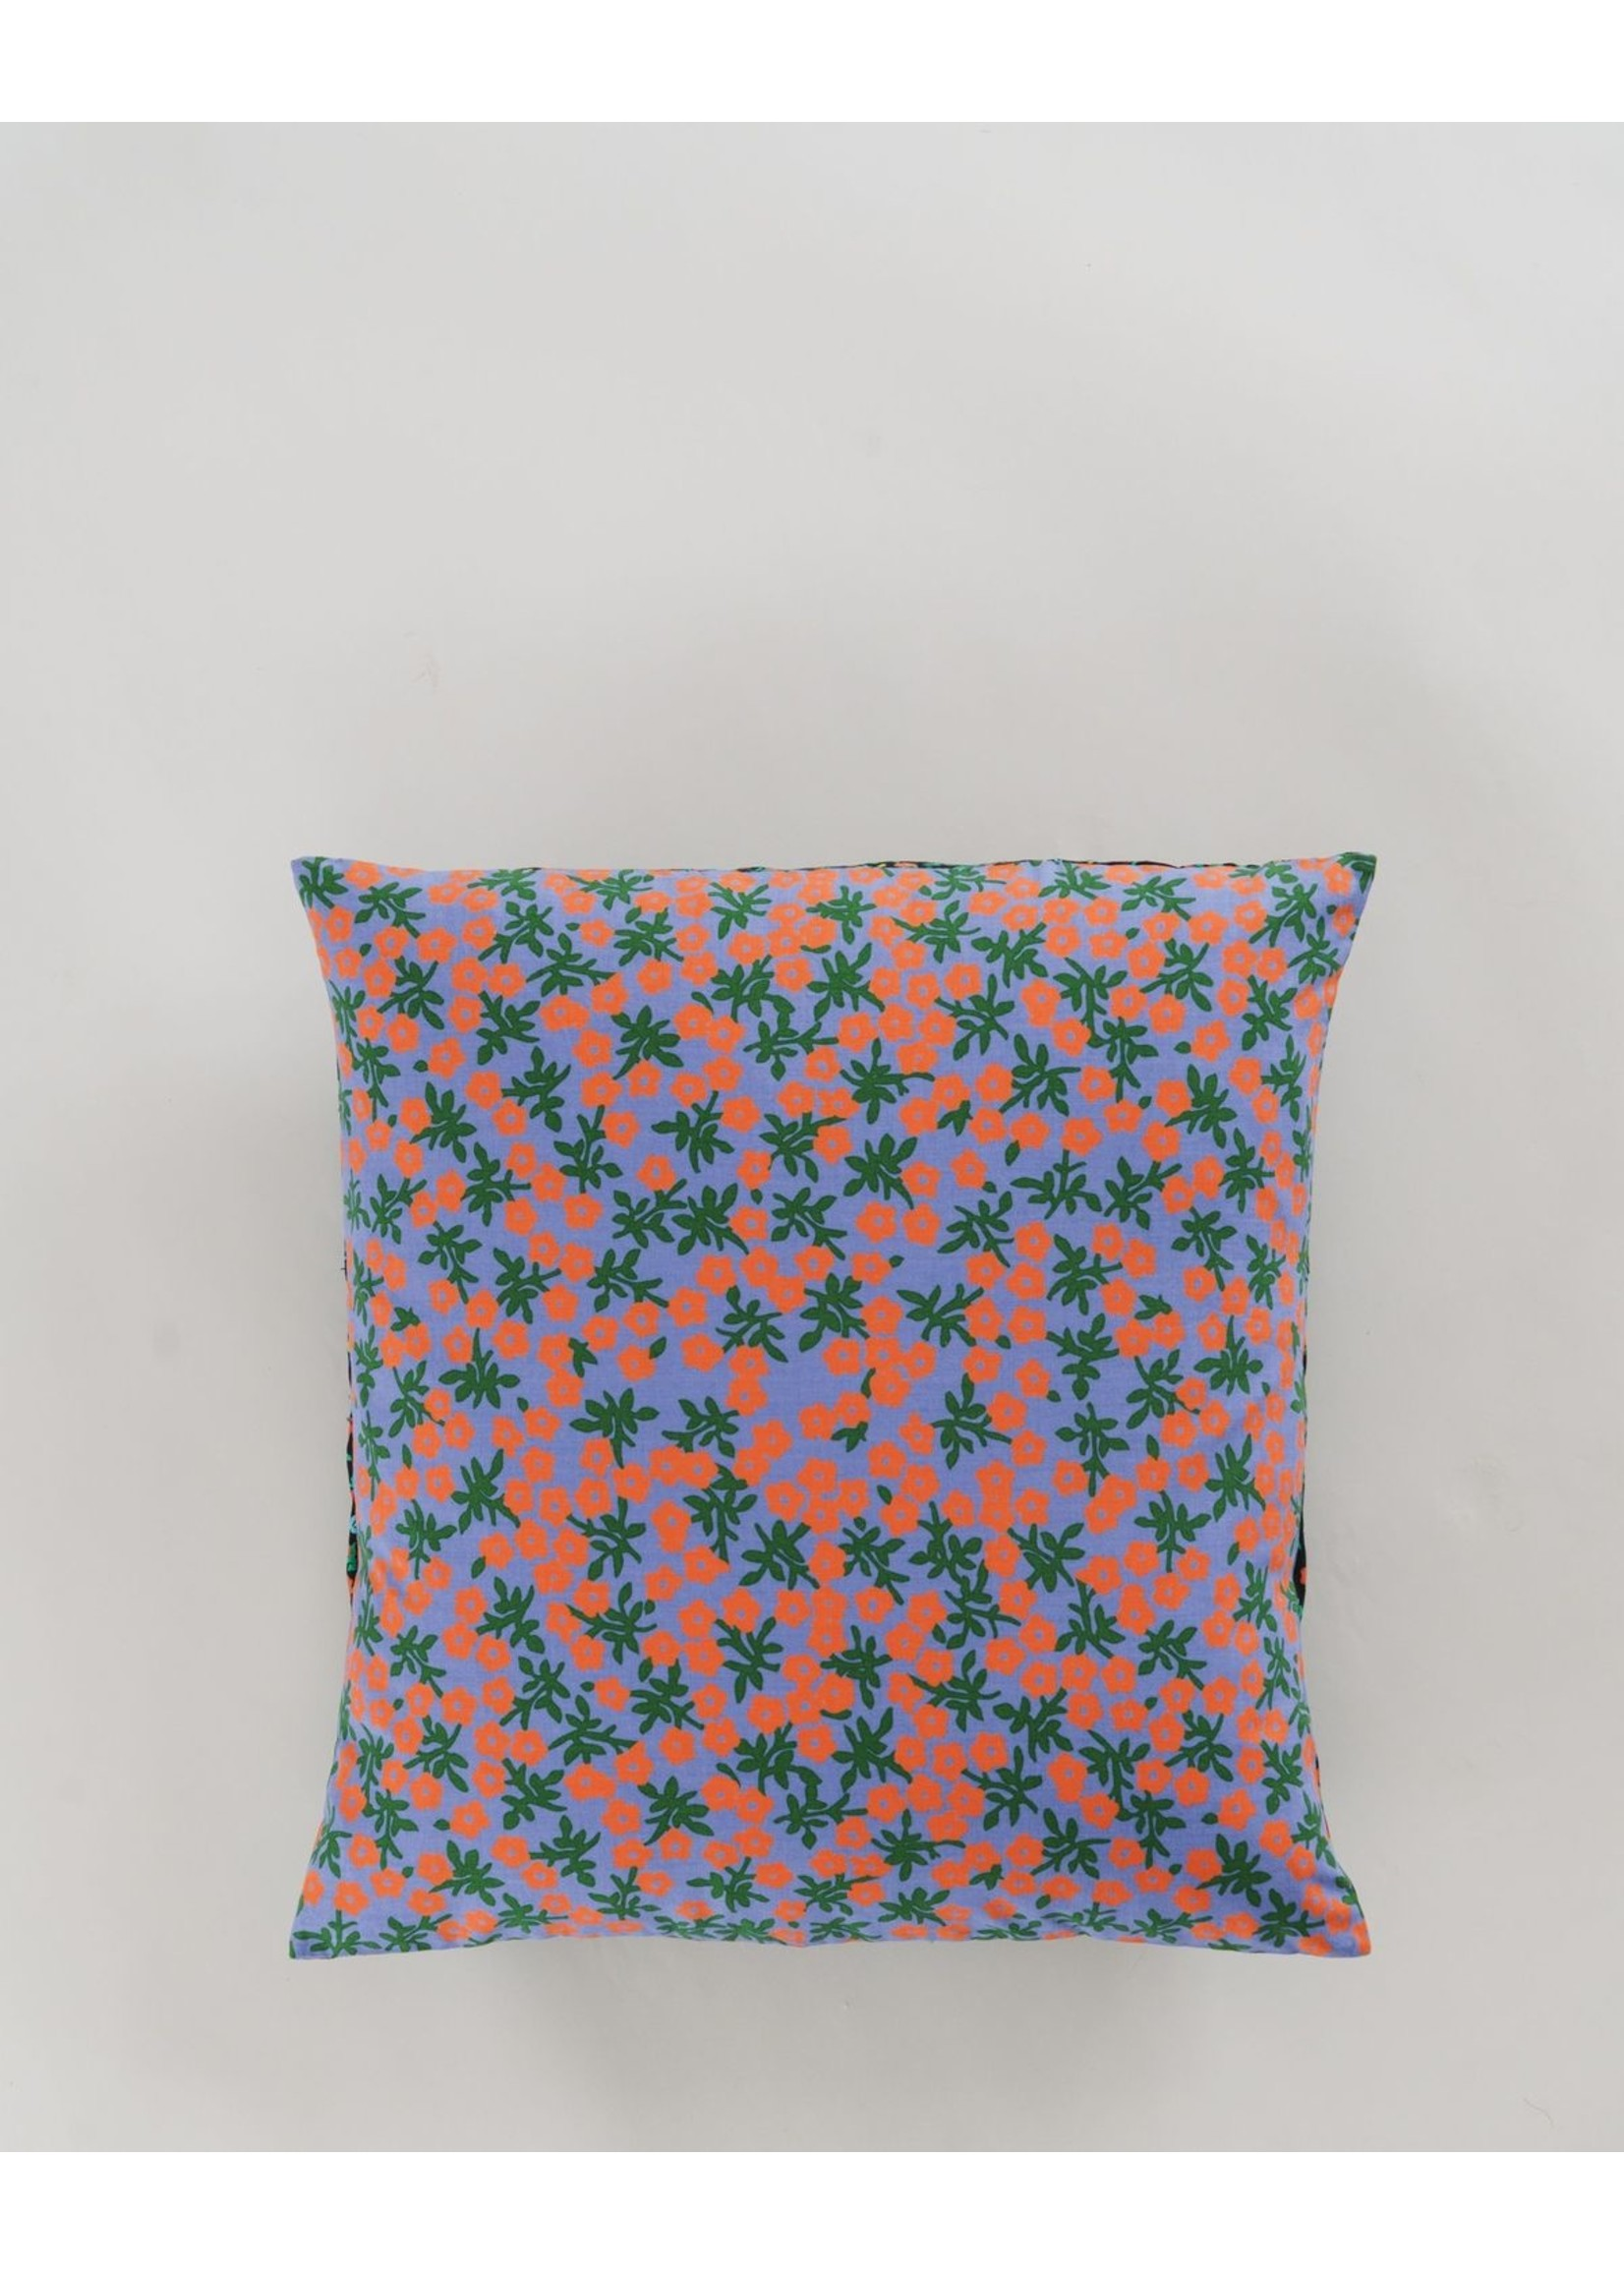 Baggu Baggu Throw Pillow Case - Calico Floral Mix